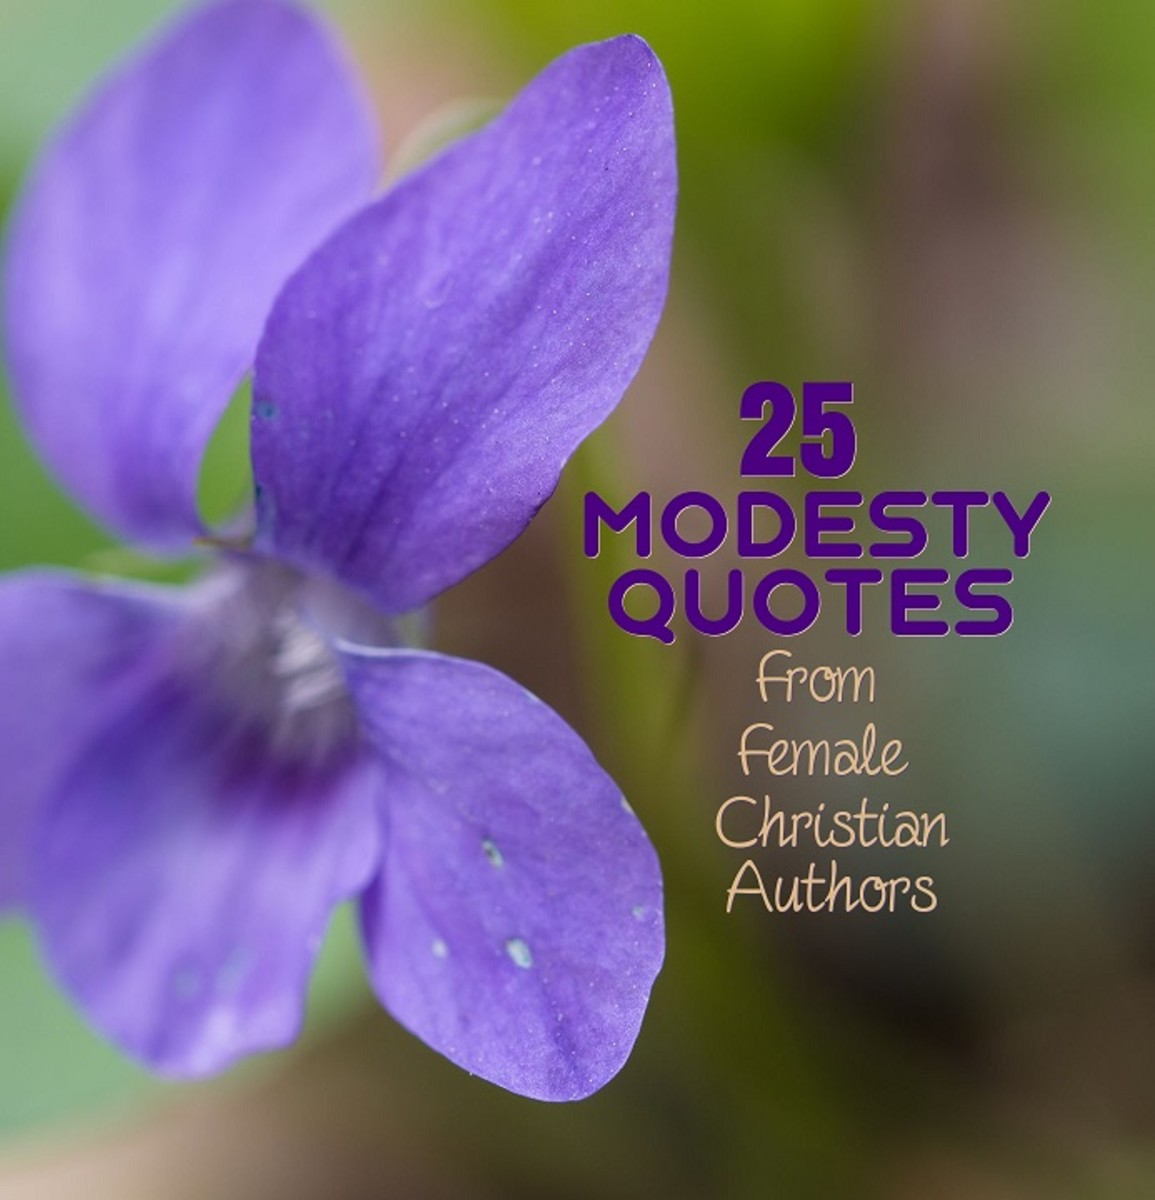 The violet flower symbolizes modesty .